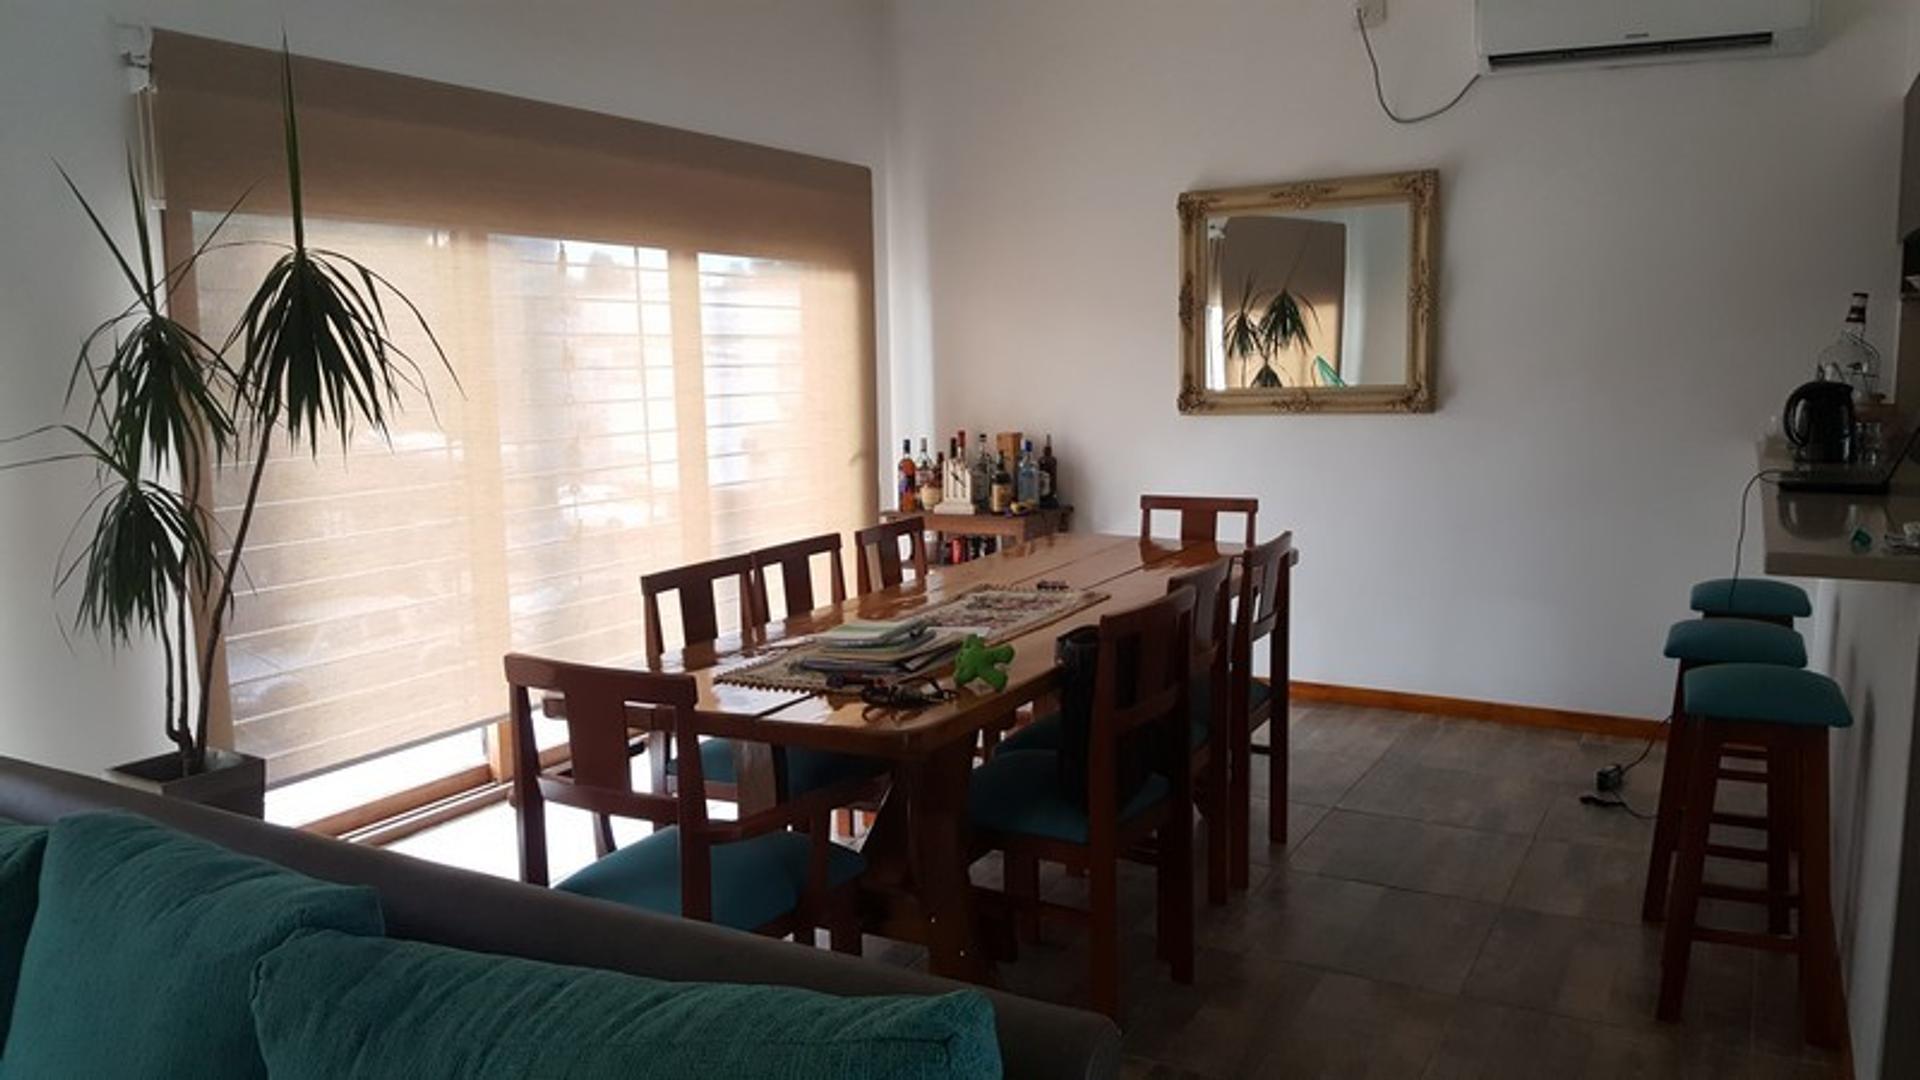 Casa - Venta - Argentina, Quilmes - BRANDSEN 367